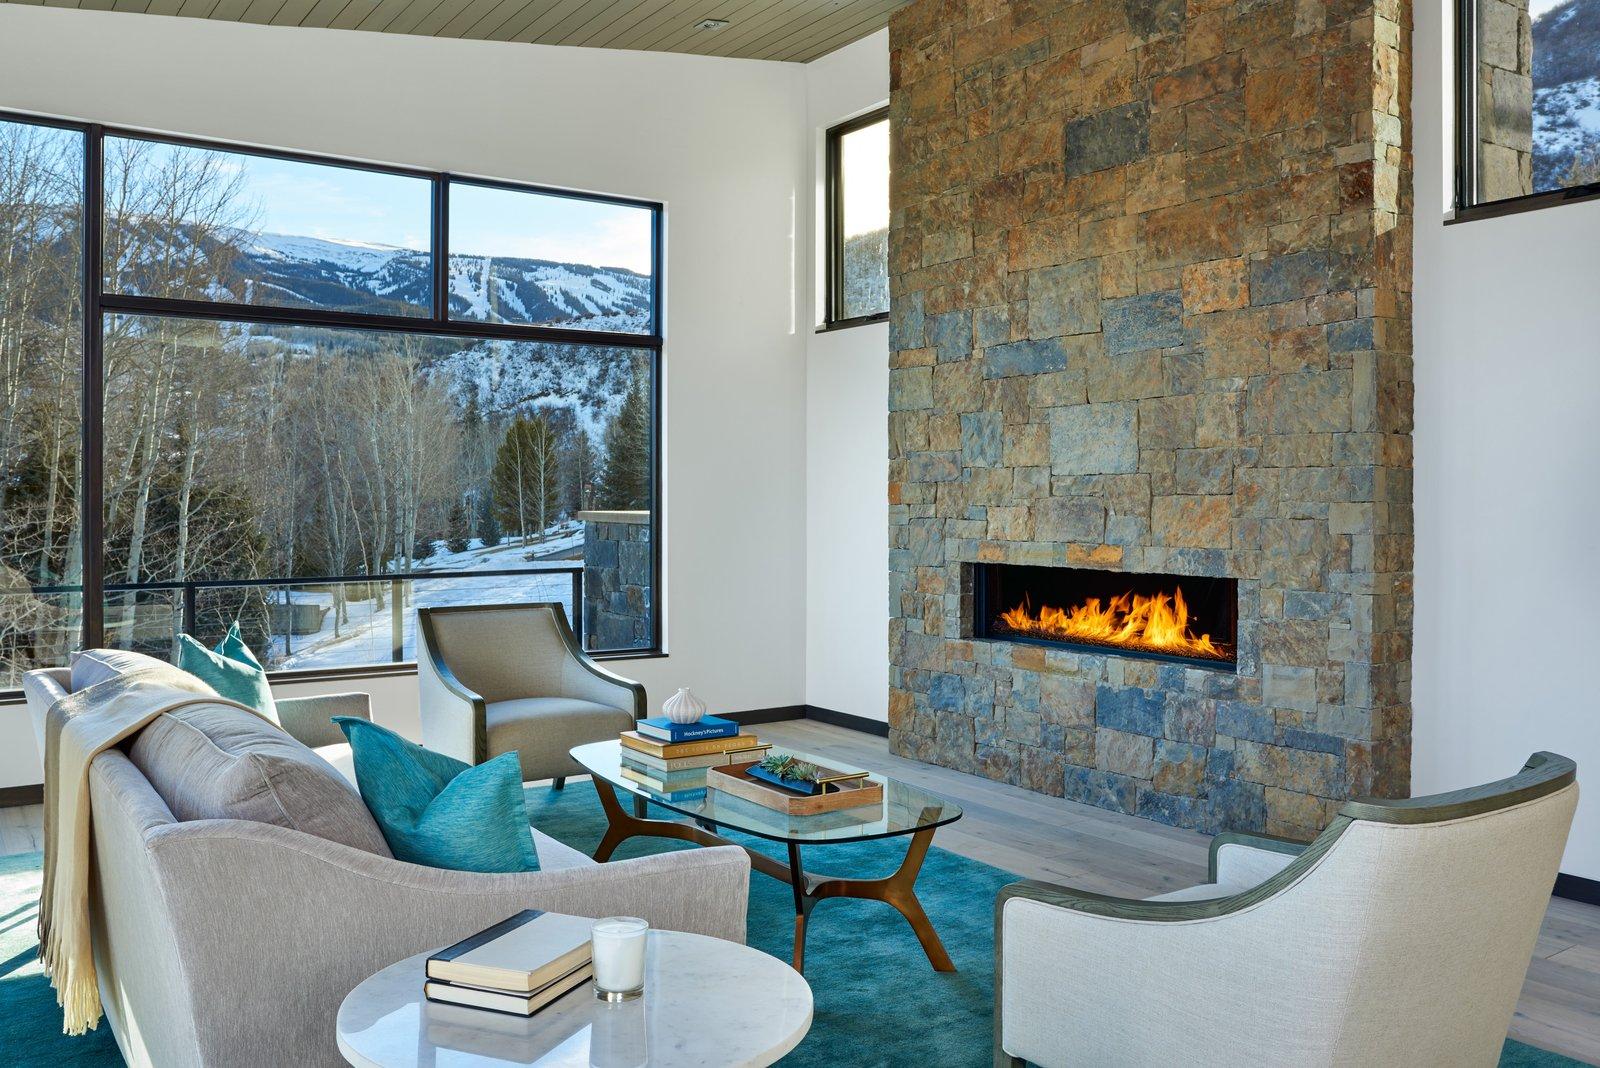 Living Room, Gas Burning Fireplace, Chair, Medium Hardwood Floor, Ceiling Lighting, Sofa, Coffee Tables, and Ribbon Fireplace  Terrace Drive by KA DesignWorks